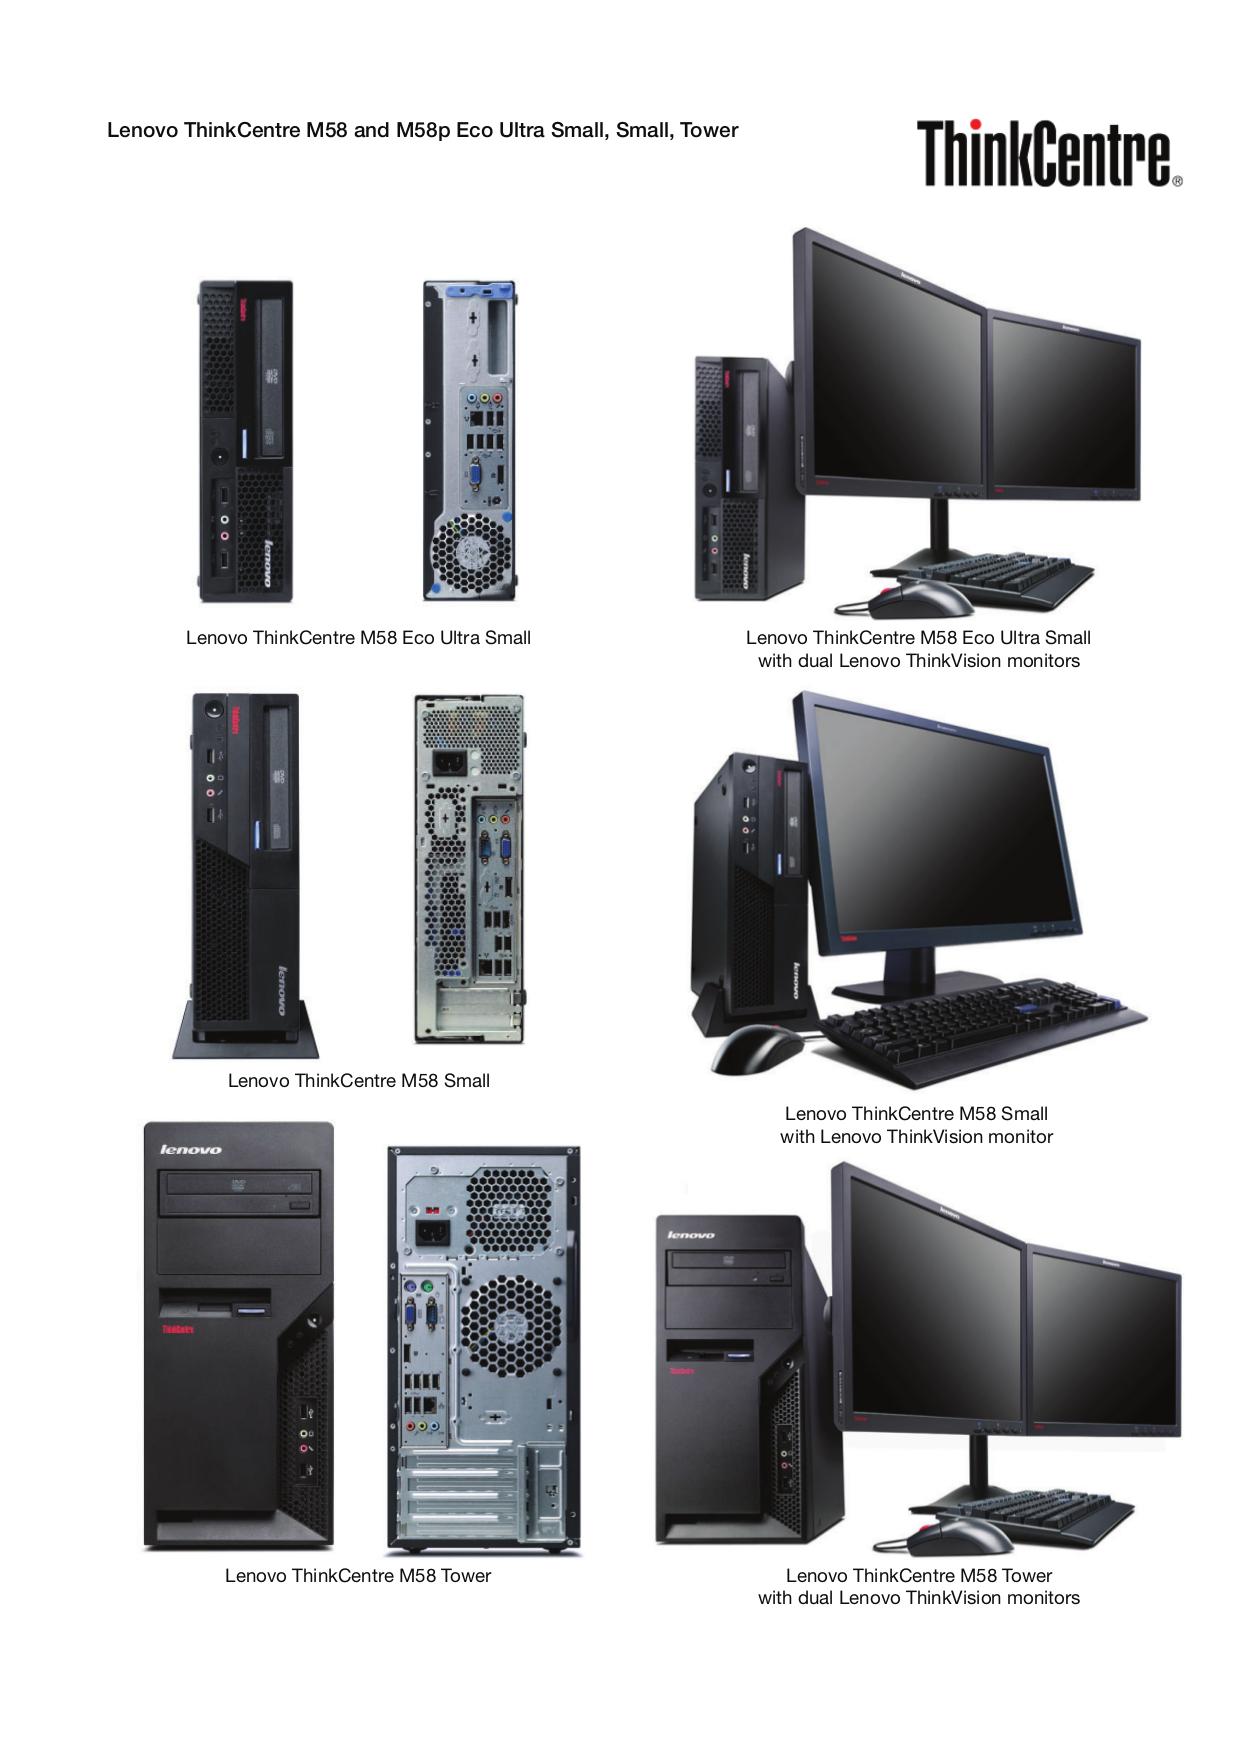 pdf for Lenovo Desktop ThinkCentre M58p 6209 manual